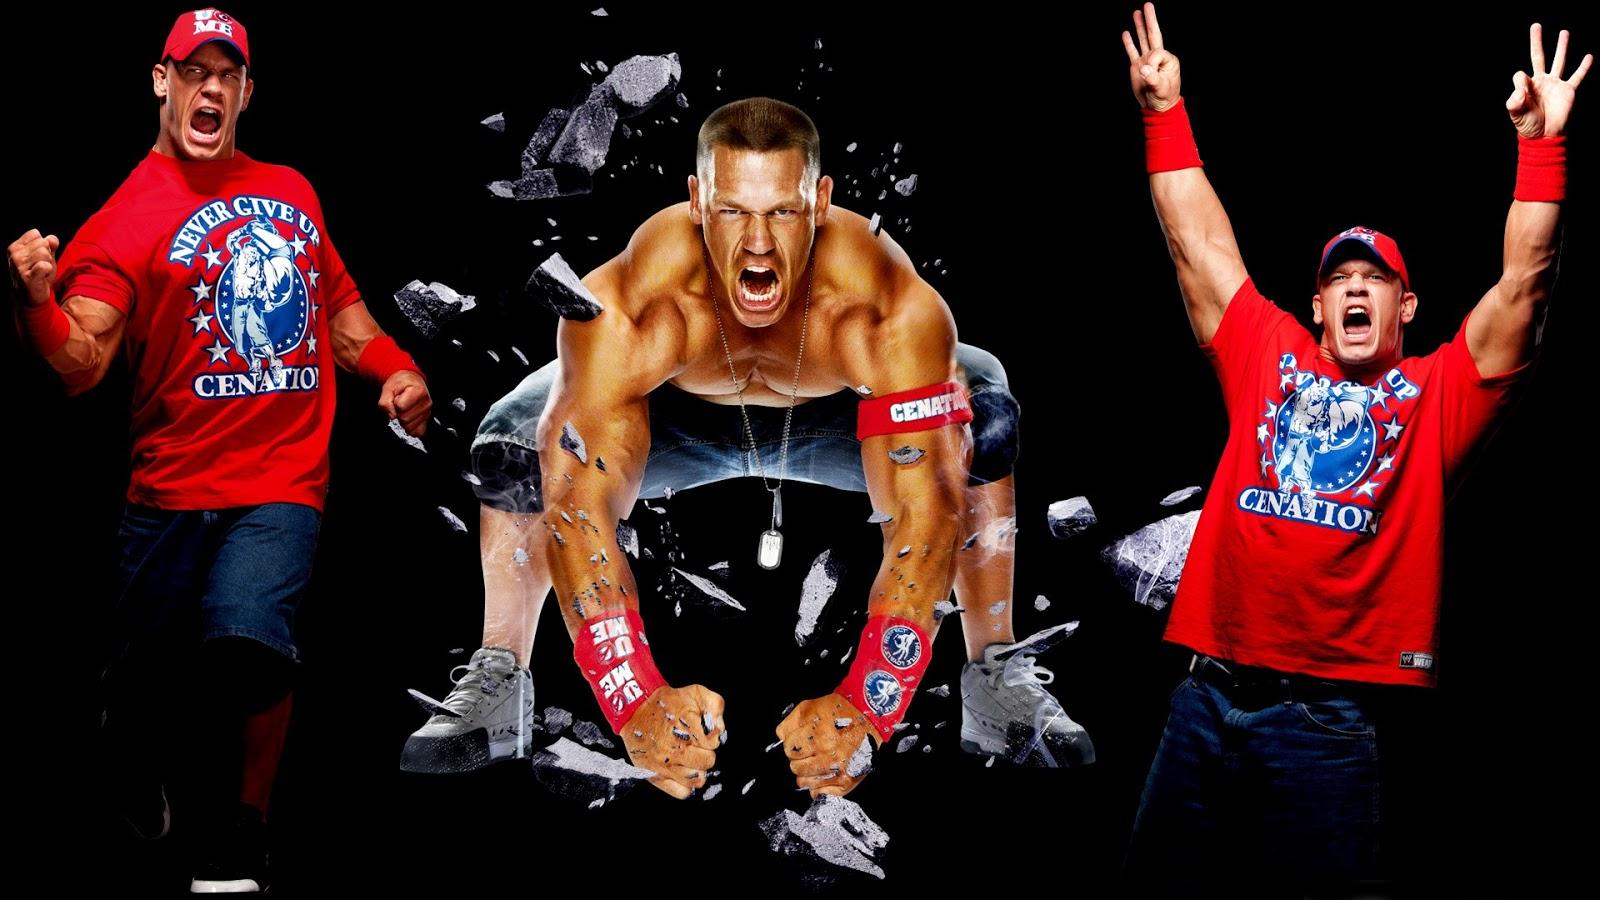 Wrestling Super Stars: John Cena New HD Wallpaper 2013